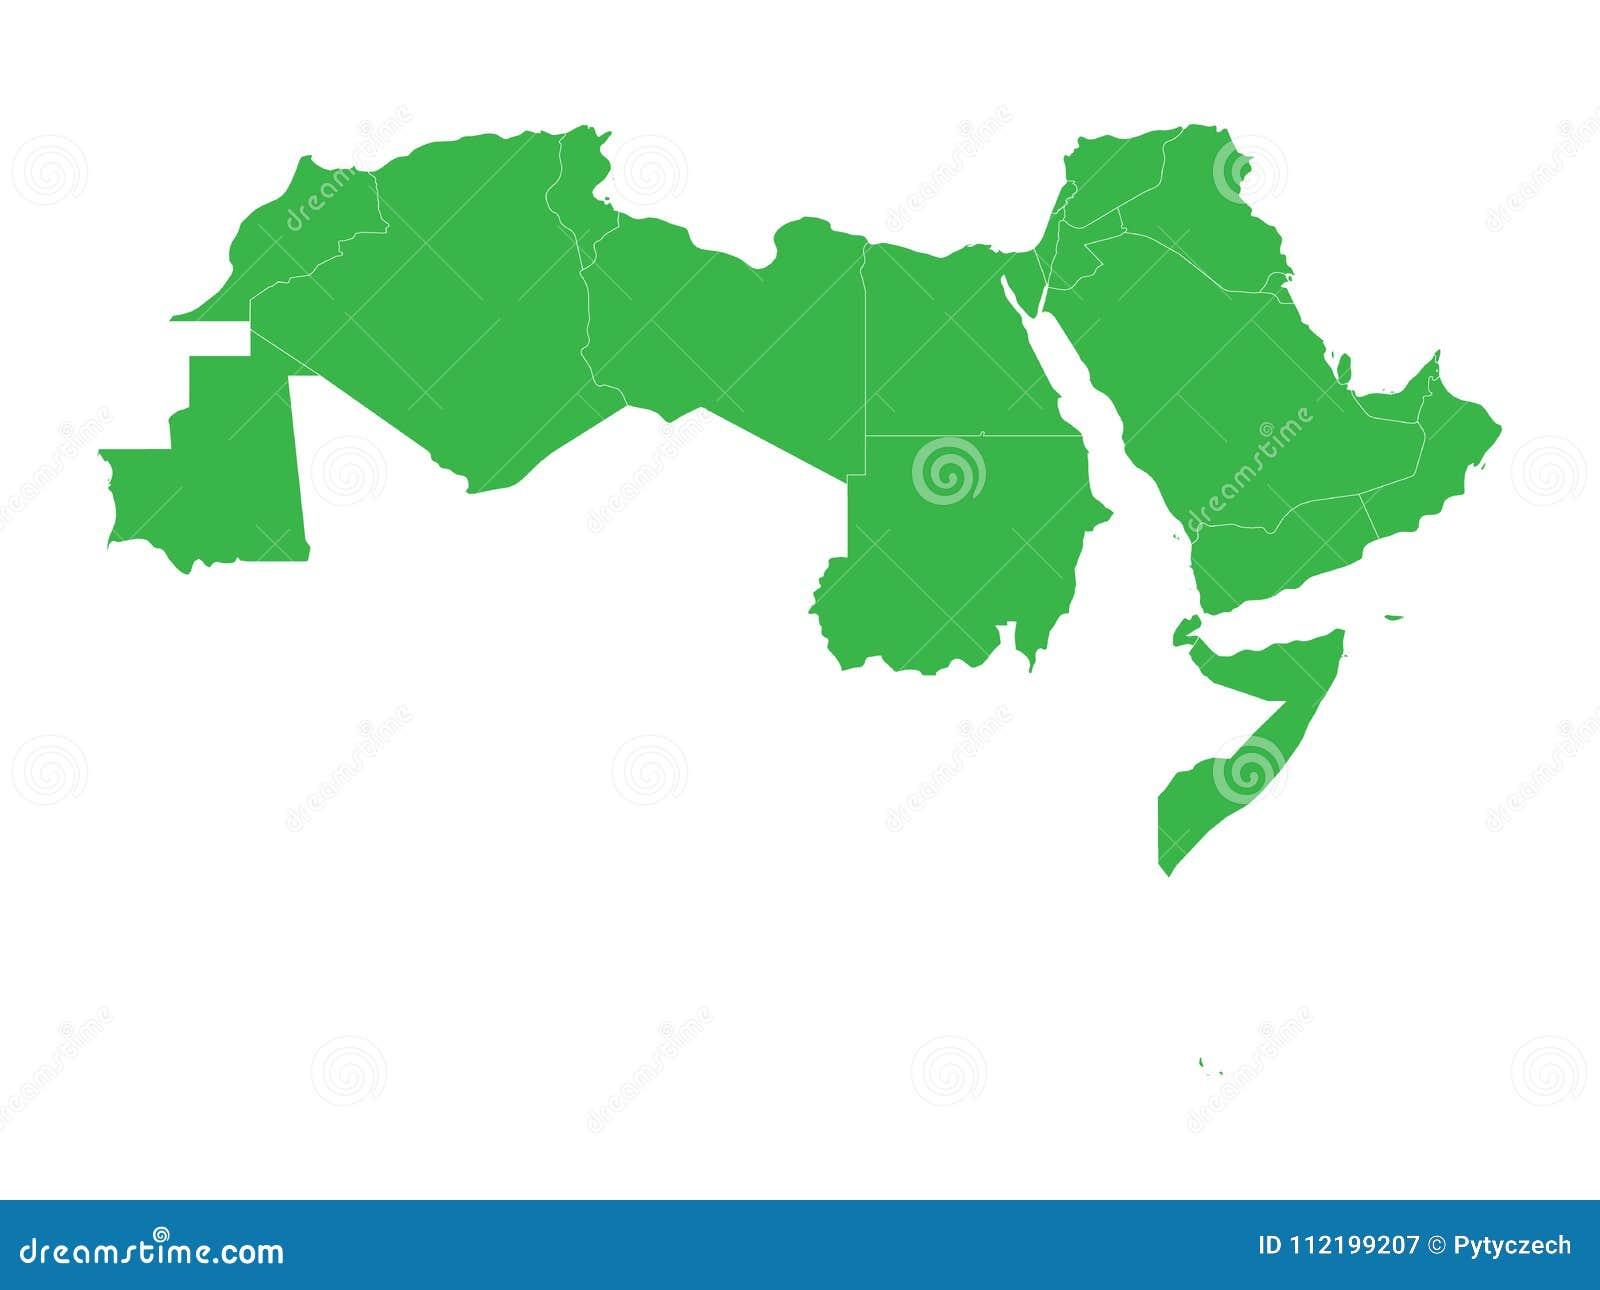 Arab World States Blank Political Map 22 Arabic speaking